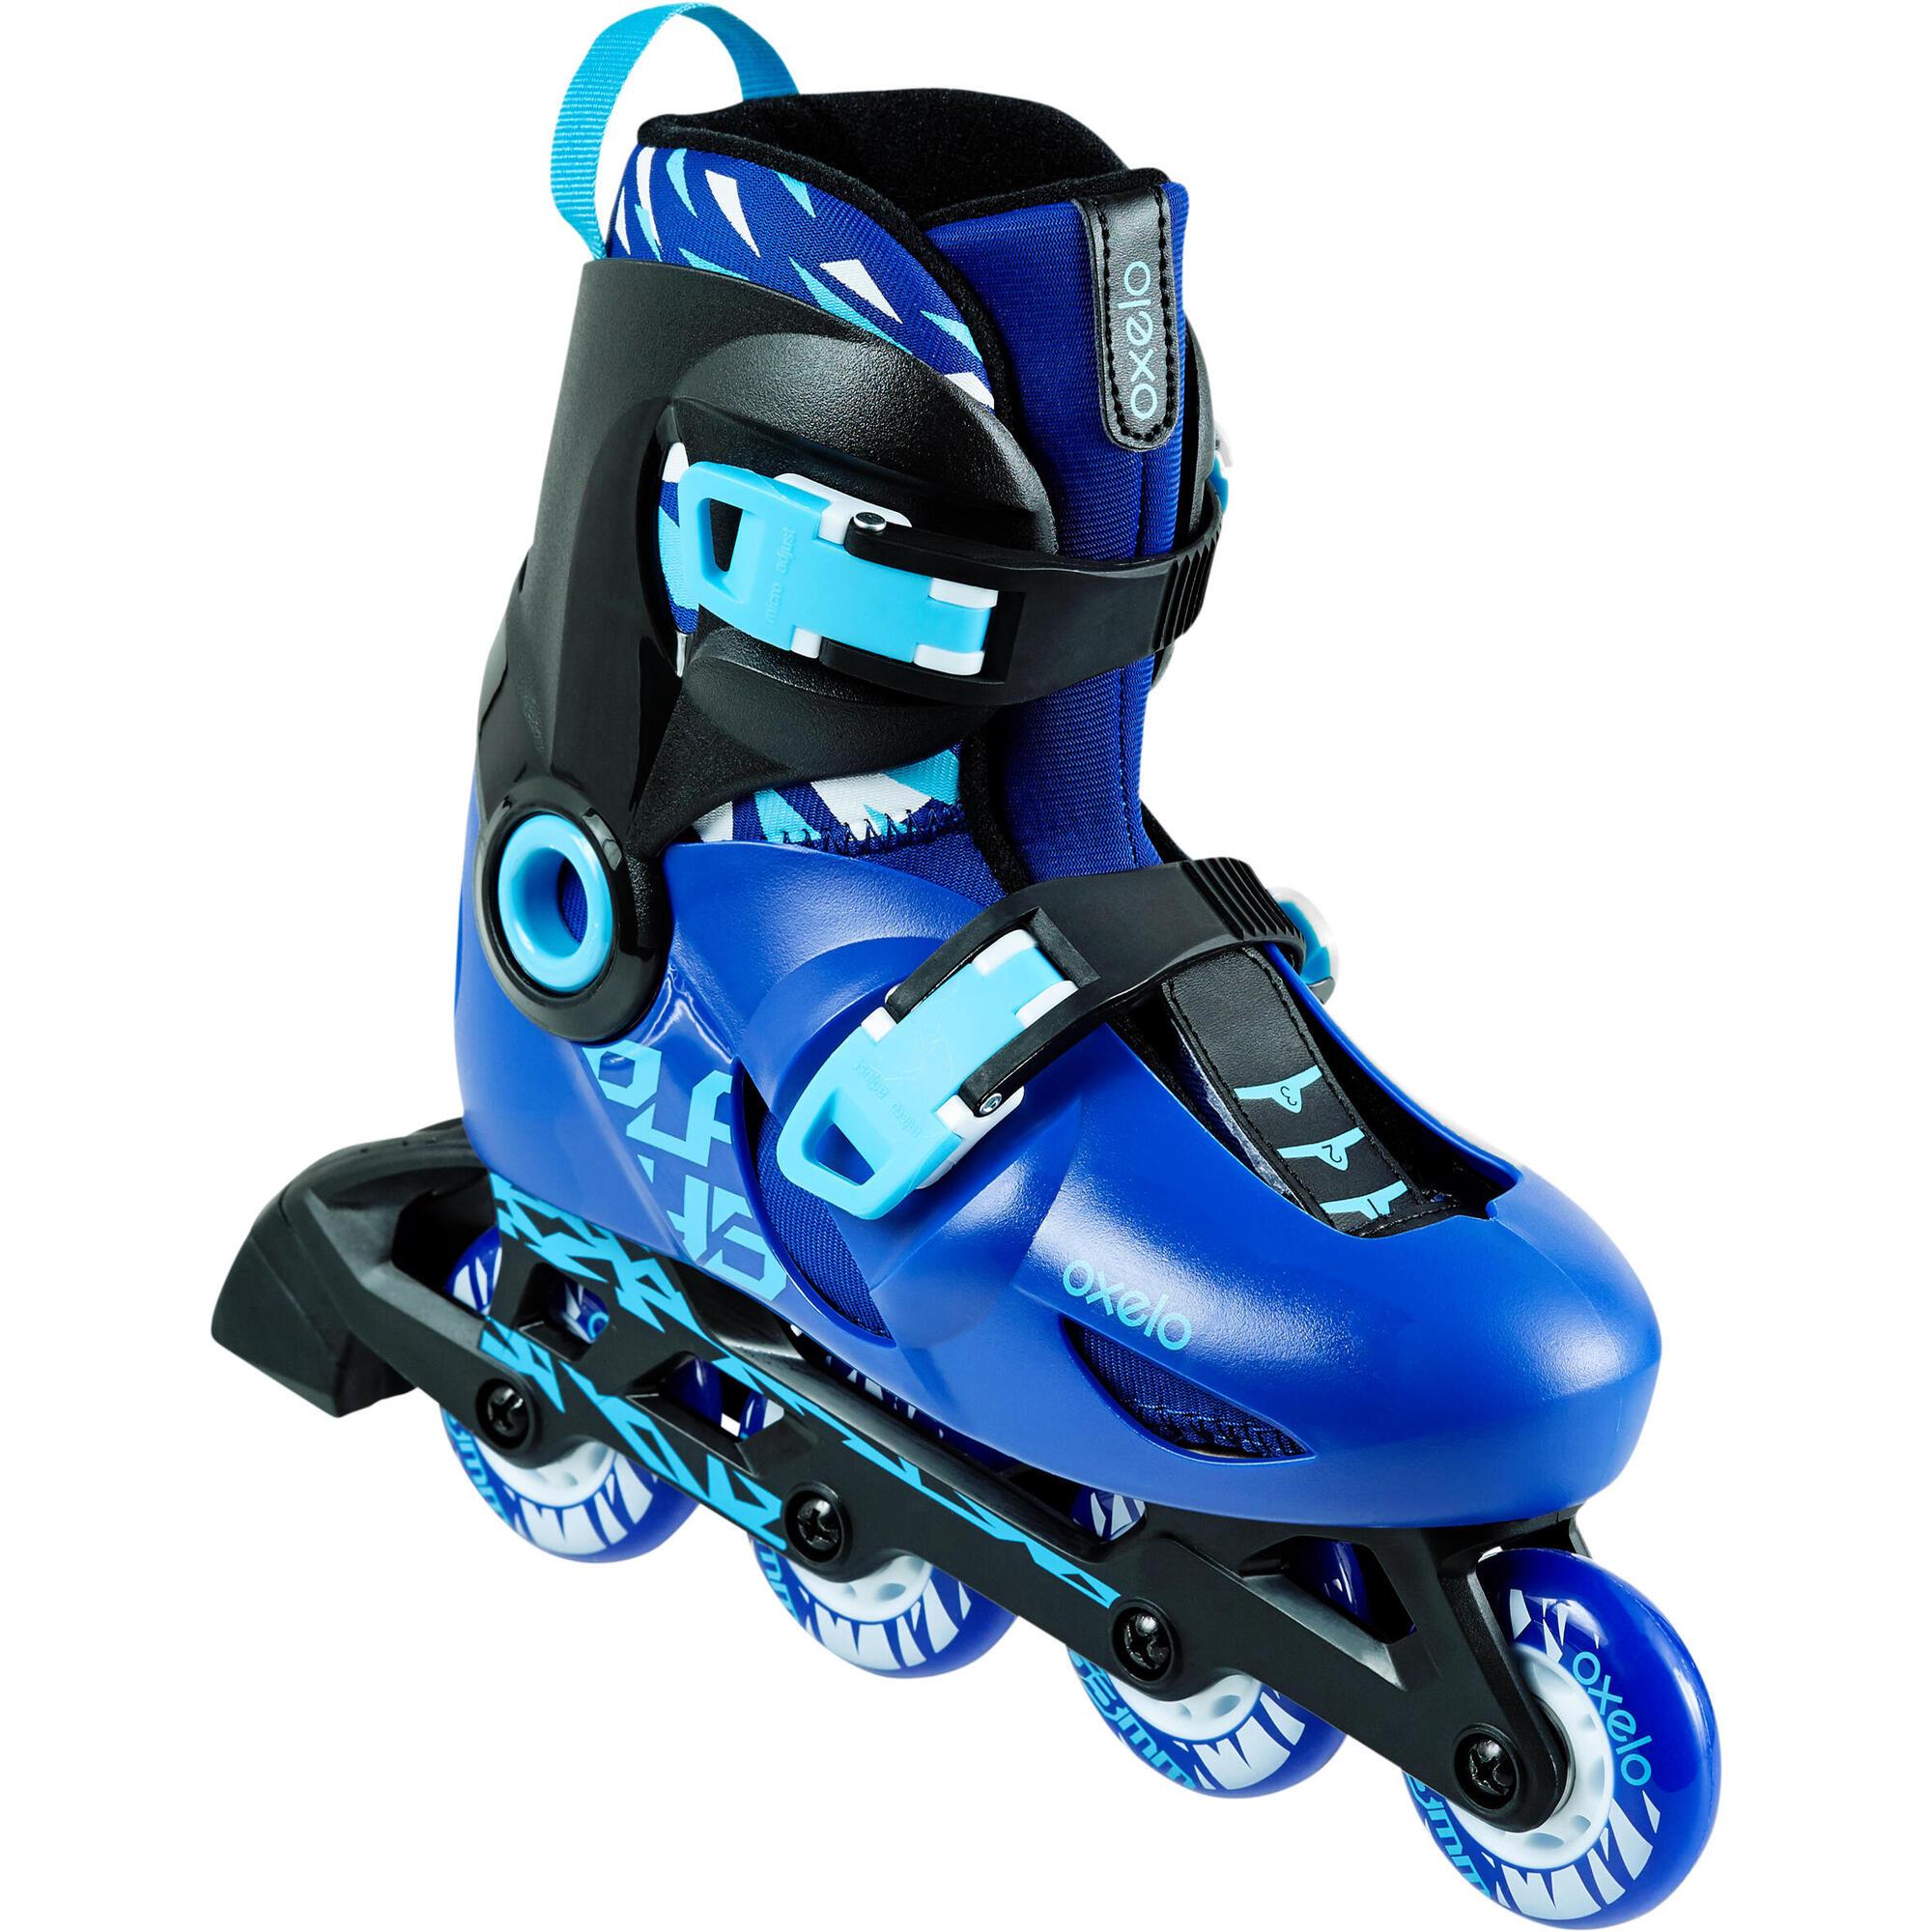 Play 5 Kids' Inline Skates - Blue & Black | oxelo